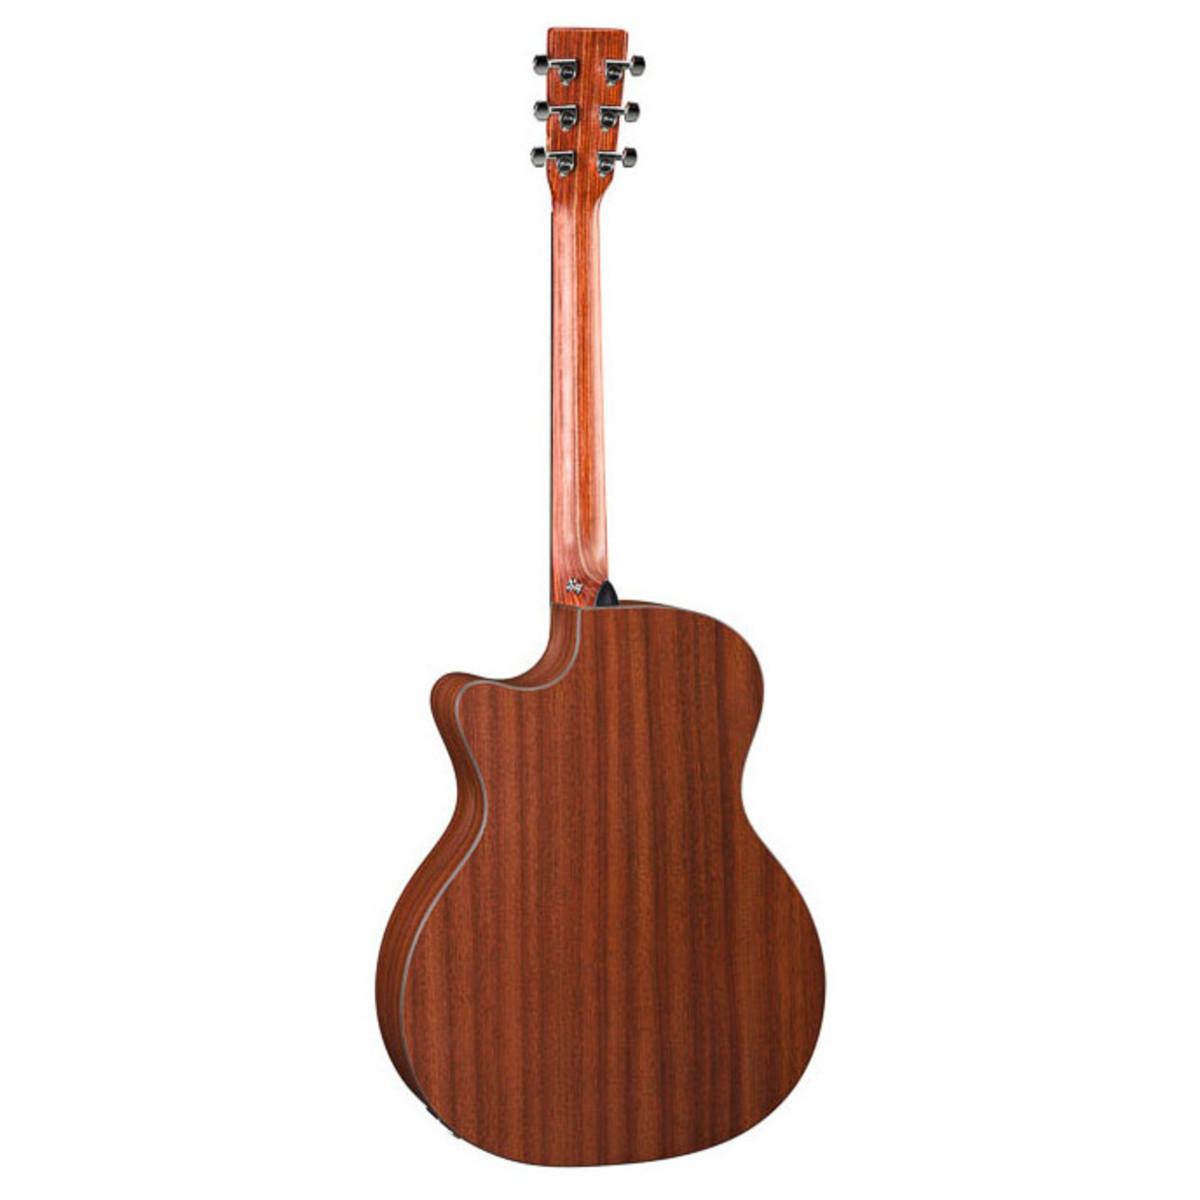 guitare electro acoustique de martin gpcx1ae naturel. Black Bedroom Furniture Sets. Home Design Ideas